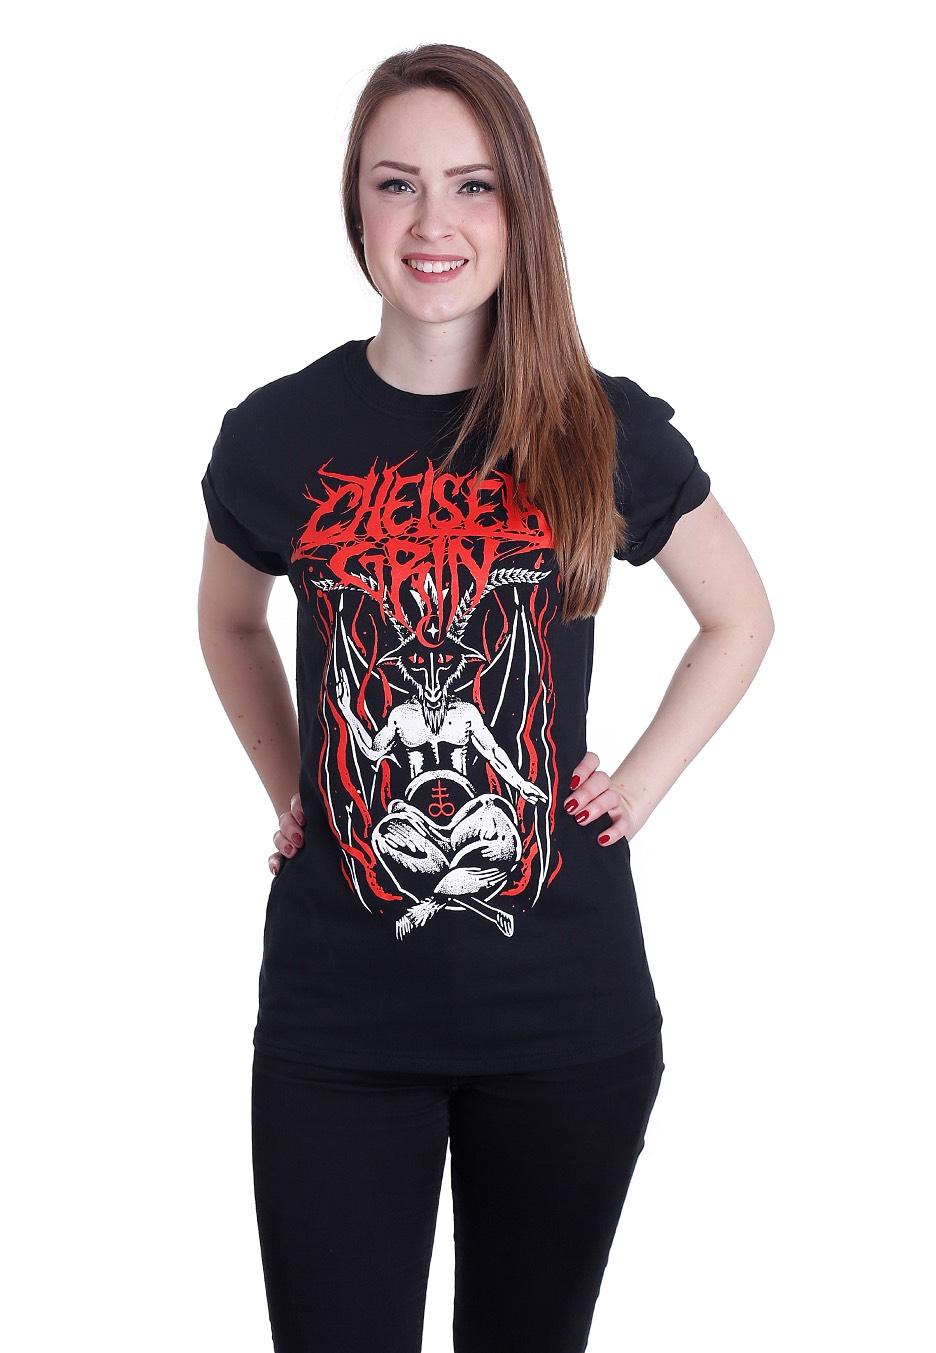 chelsea grin doom lord t shirt official deathcore merchandise shop uk. Black Bedroom Furniture Sets. Home Design Ideas